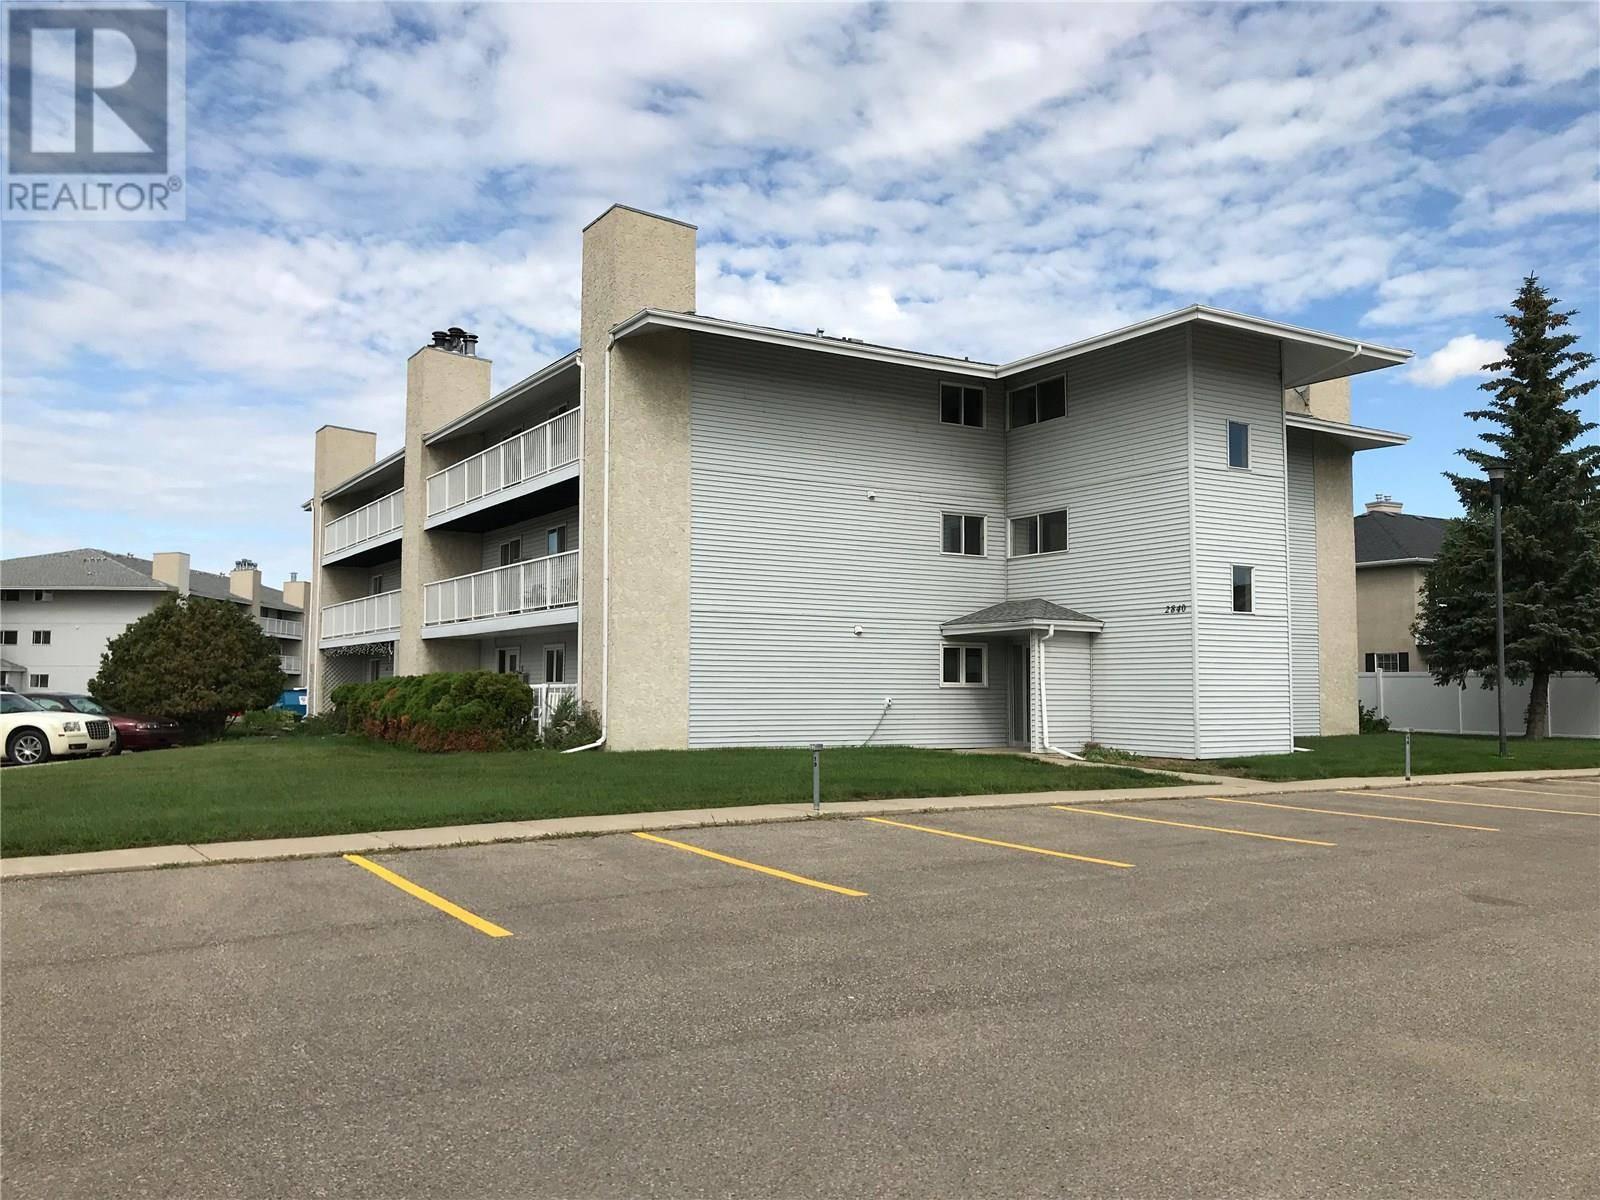 Buliding: 2840 Arens Road East, Regina, SK